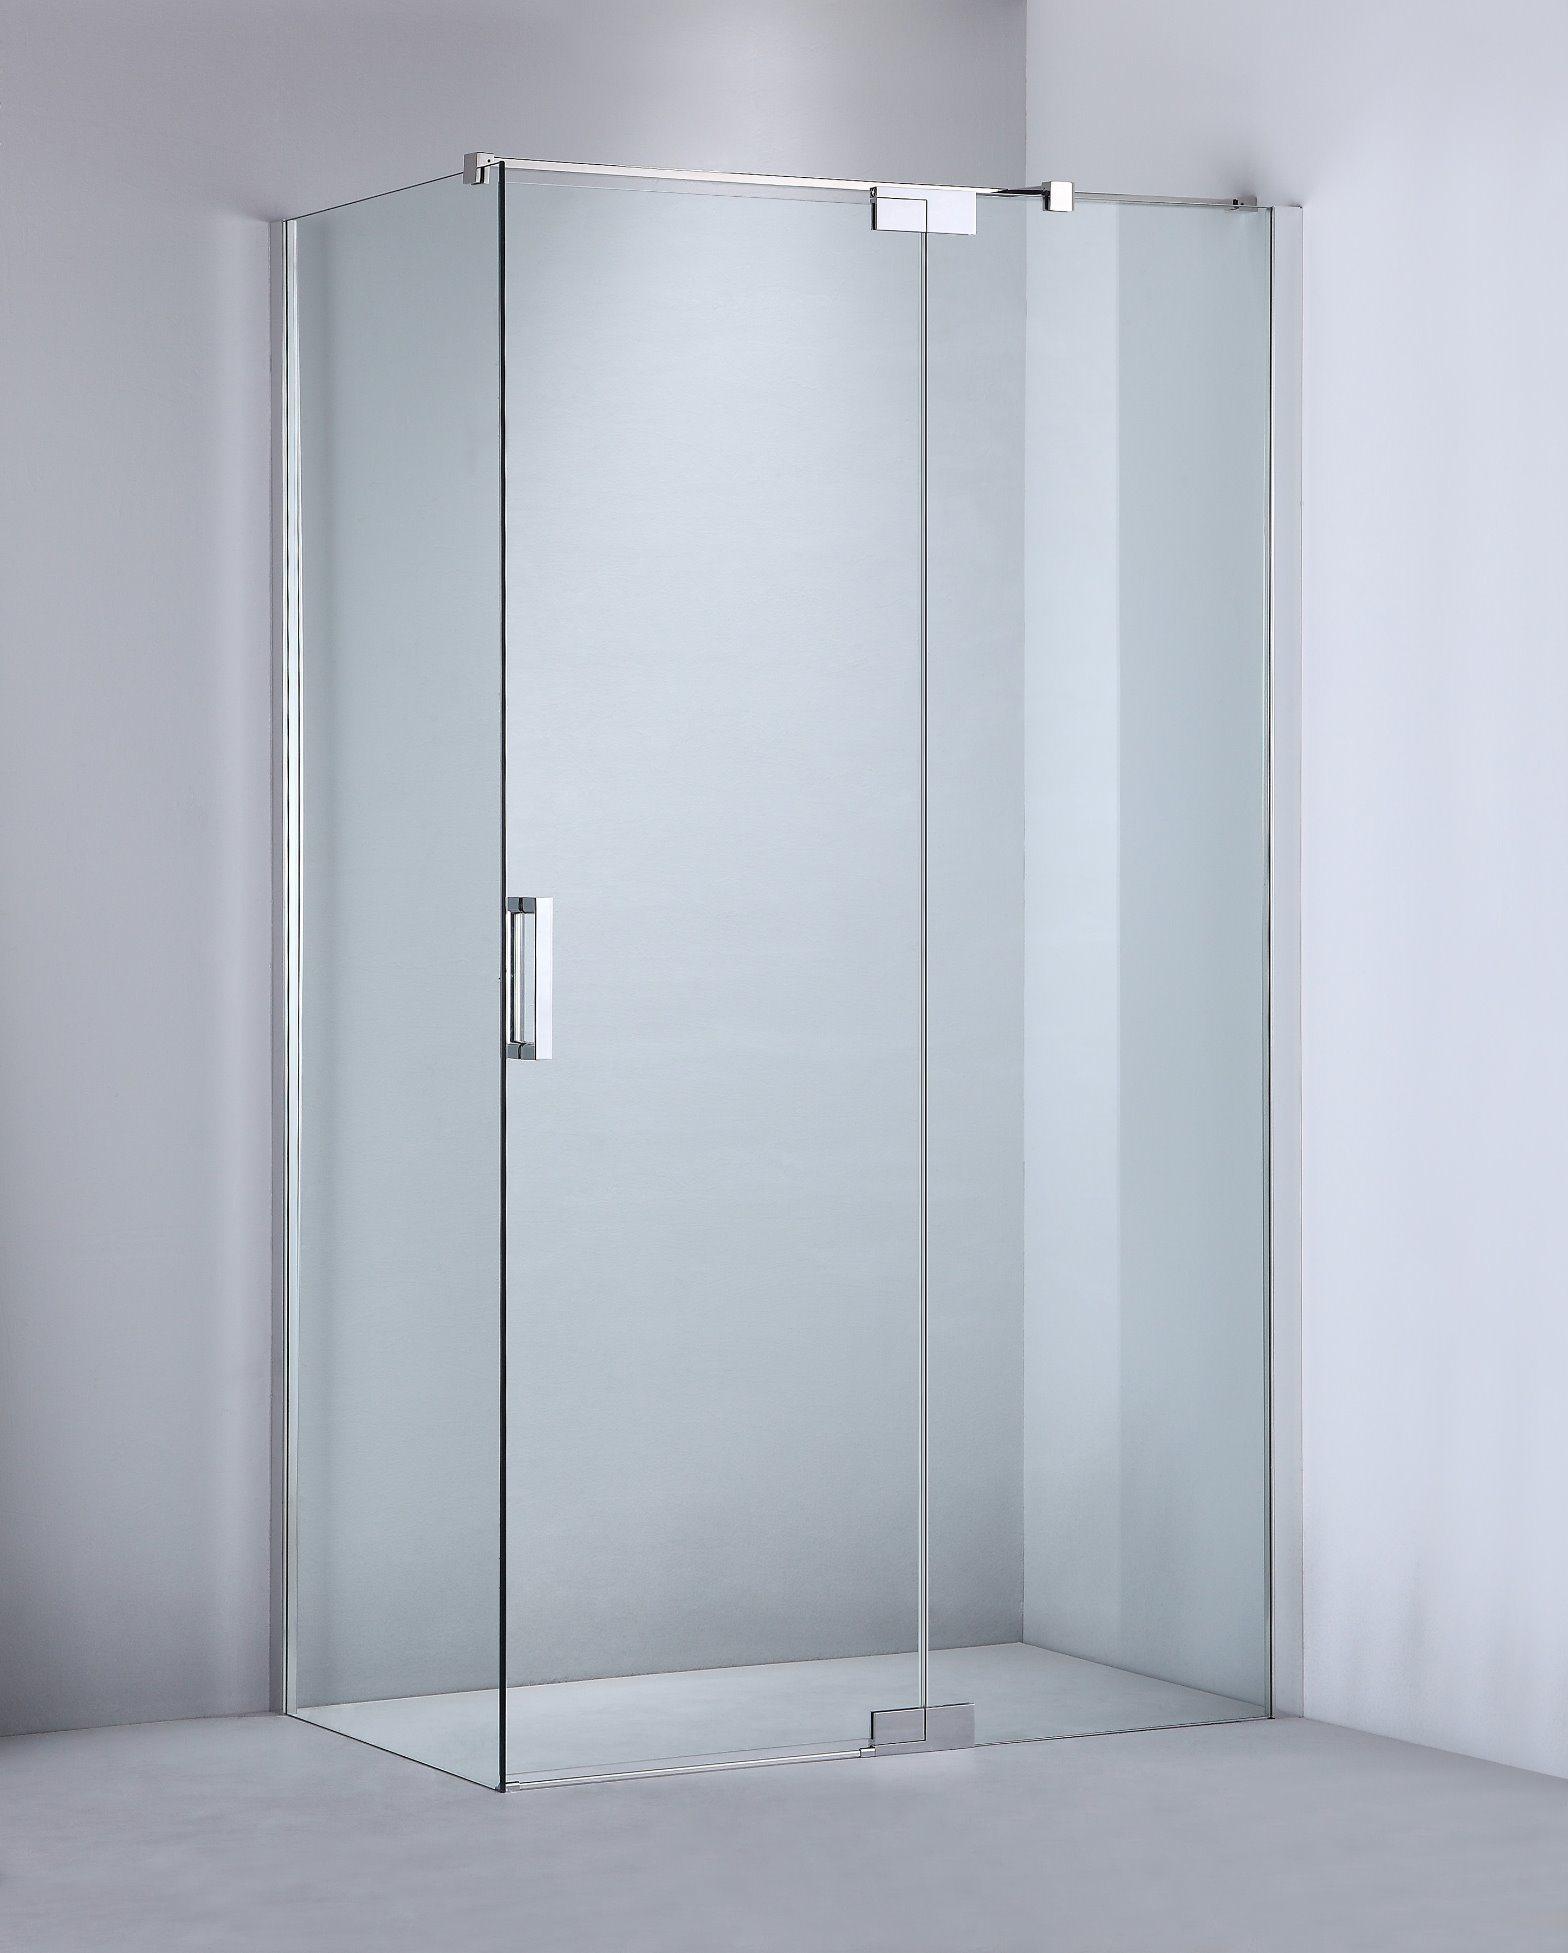 China Hinge Open Bath Shower Screen China Shower